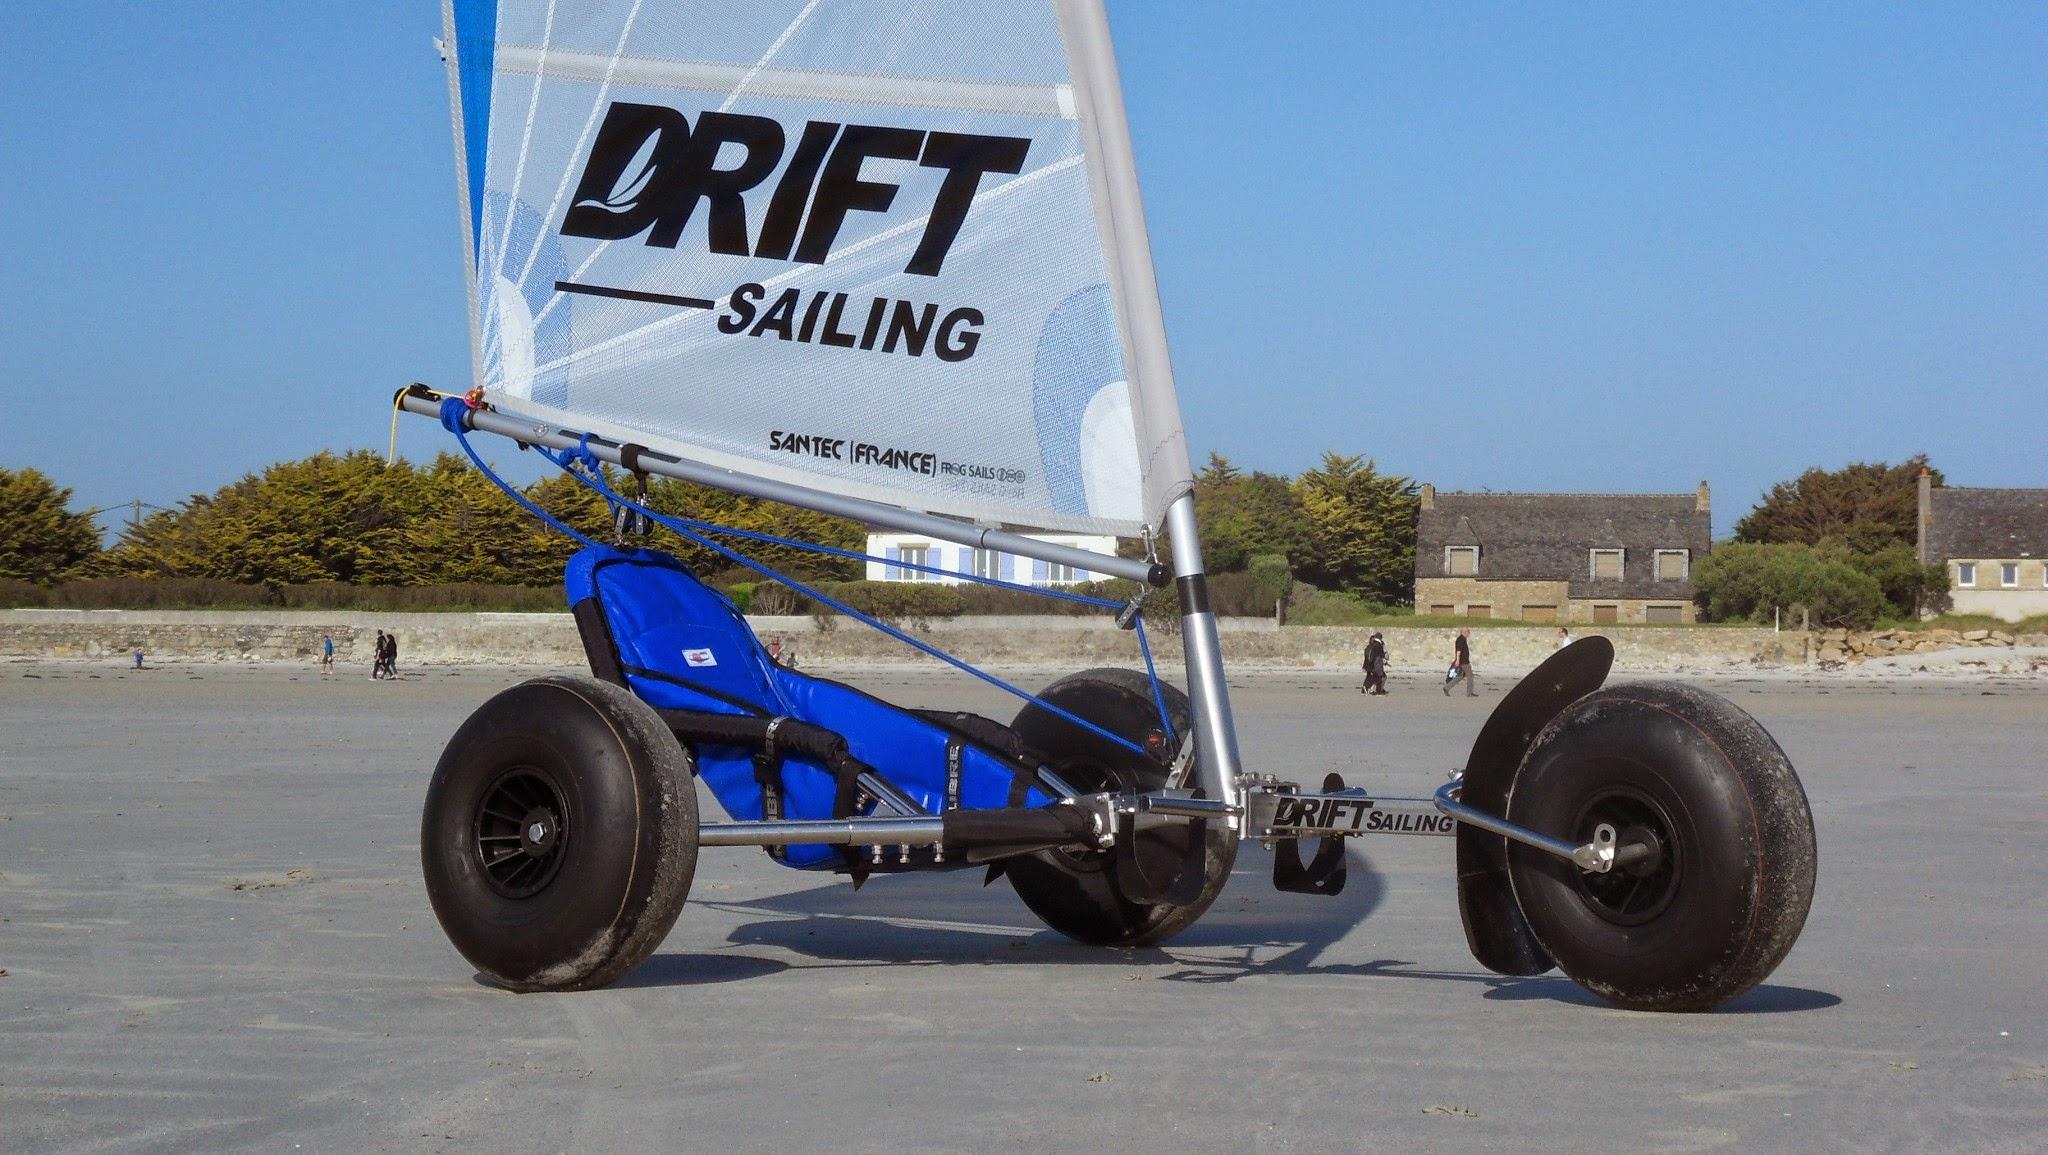 Nouveau Char A Voile Monster Kart Drift Sailing Char A Voile Loisir Et Competitiondrift Sailing Char A Voile Loisir Et Competition